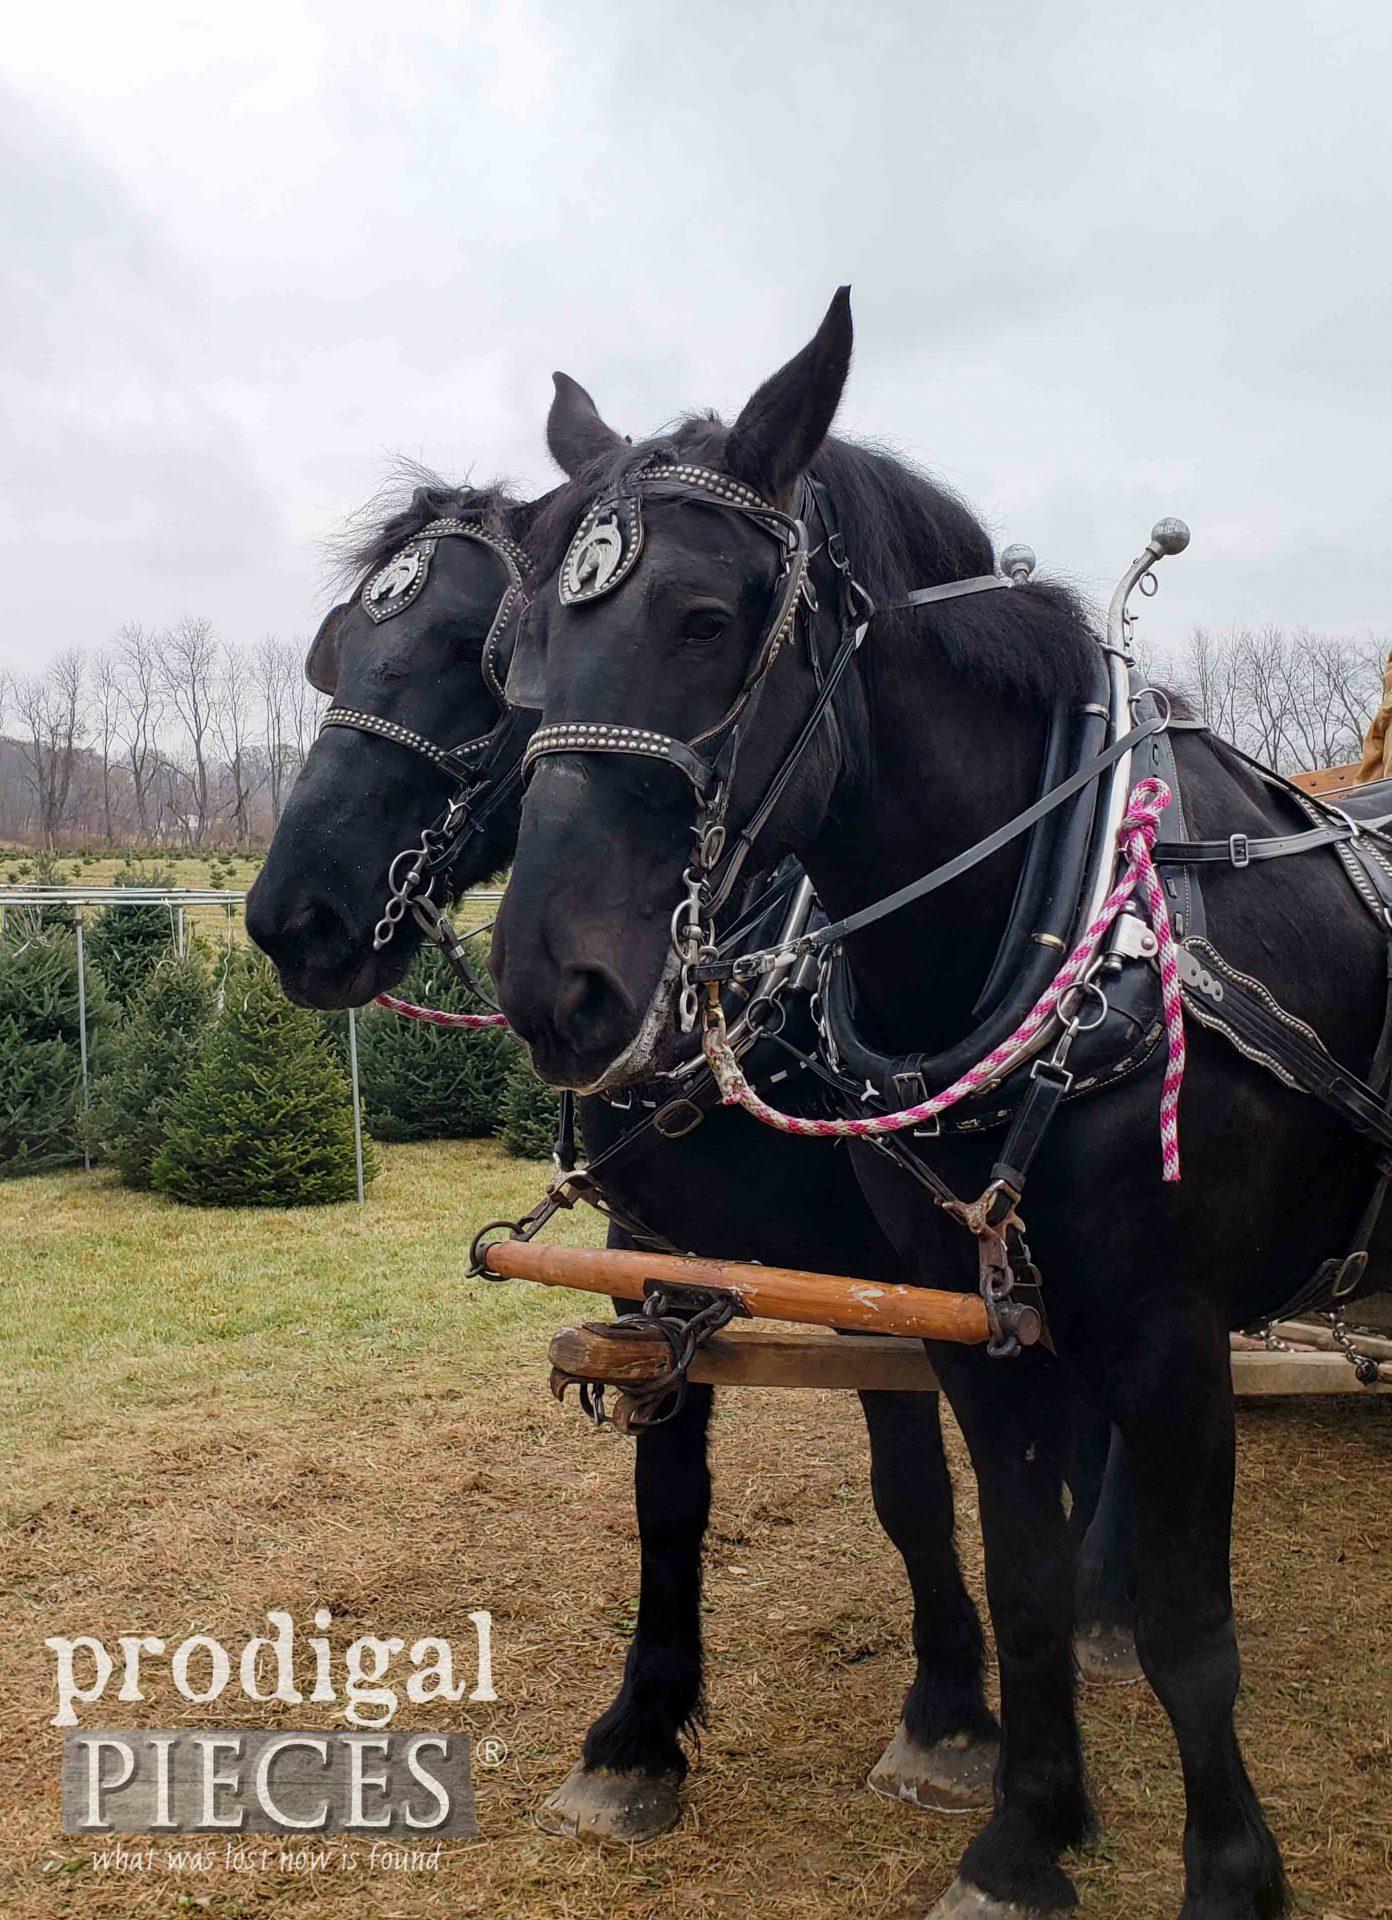 Pair of Percheron Horses Pulling Christmas Tree Sleigh | prodigalpieces.com